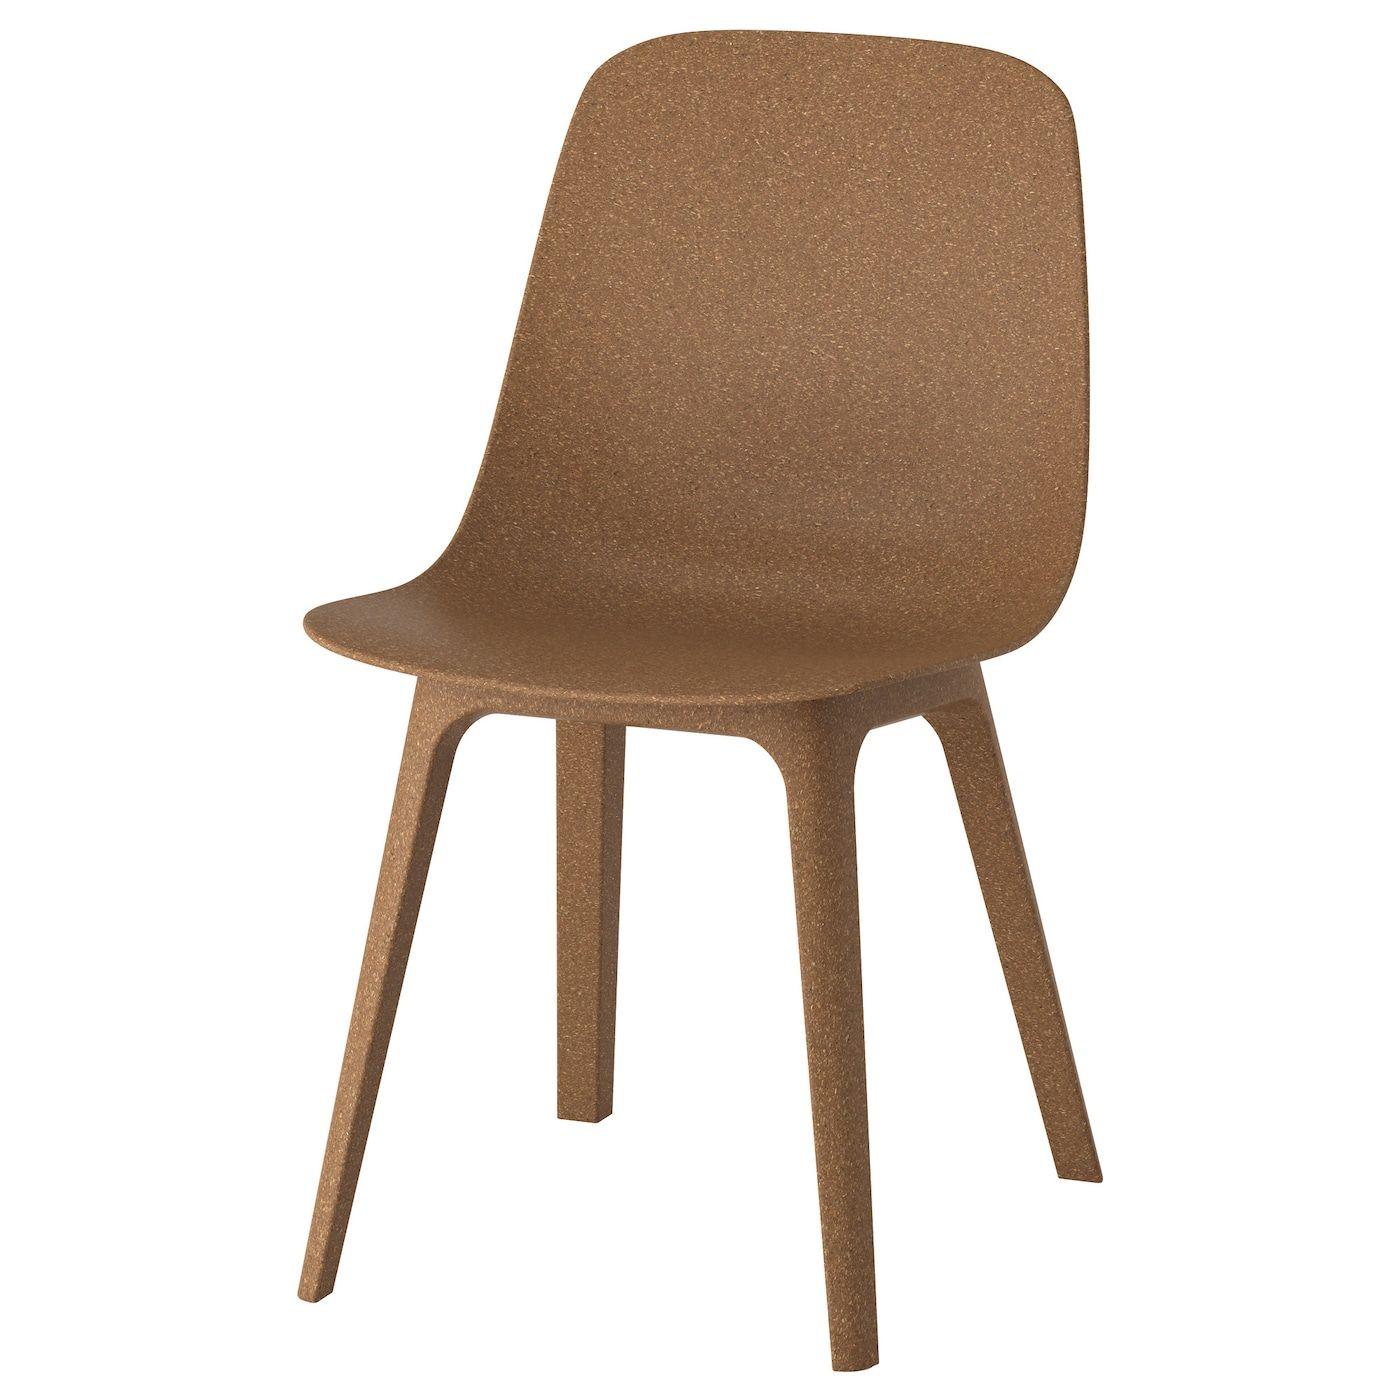 Chaise Odger Brun A Acheter Chaise Ikea Chaise Et